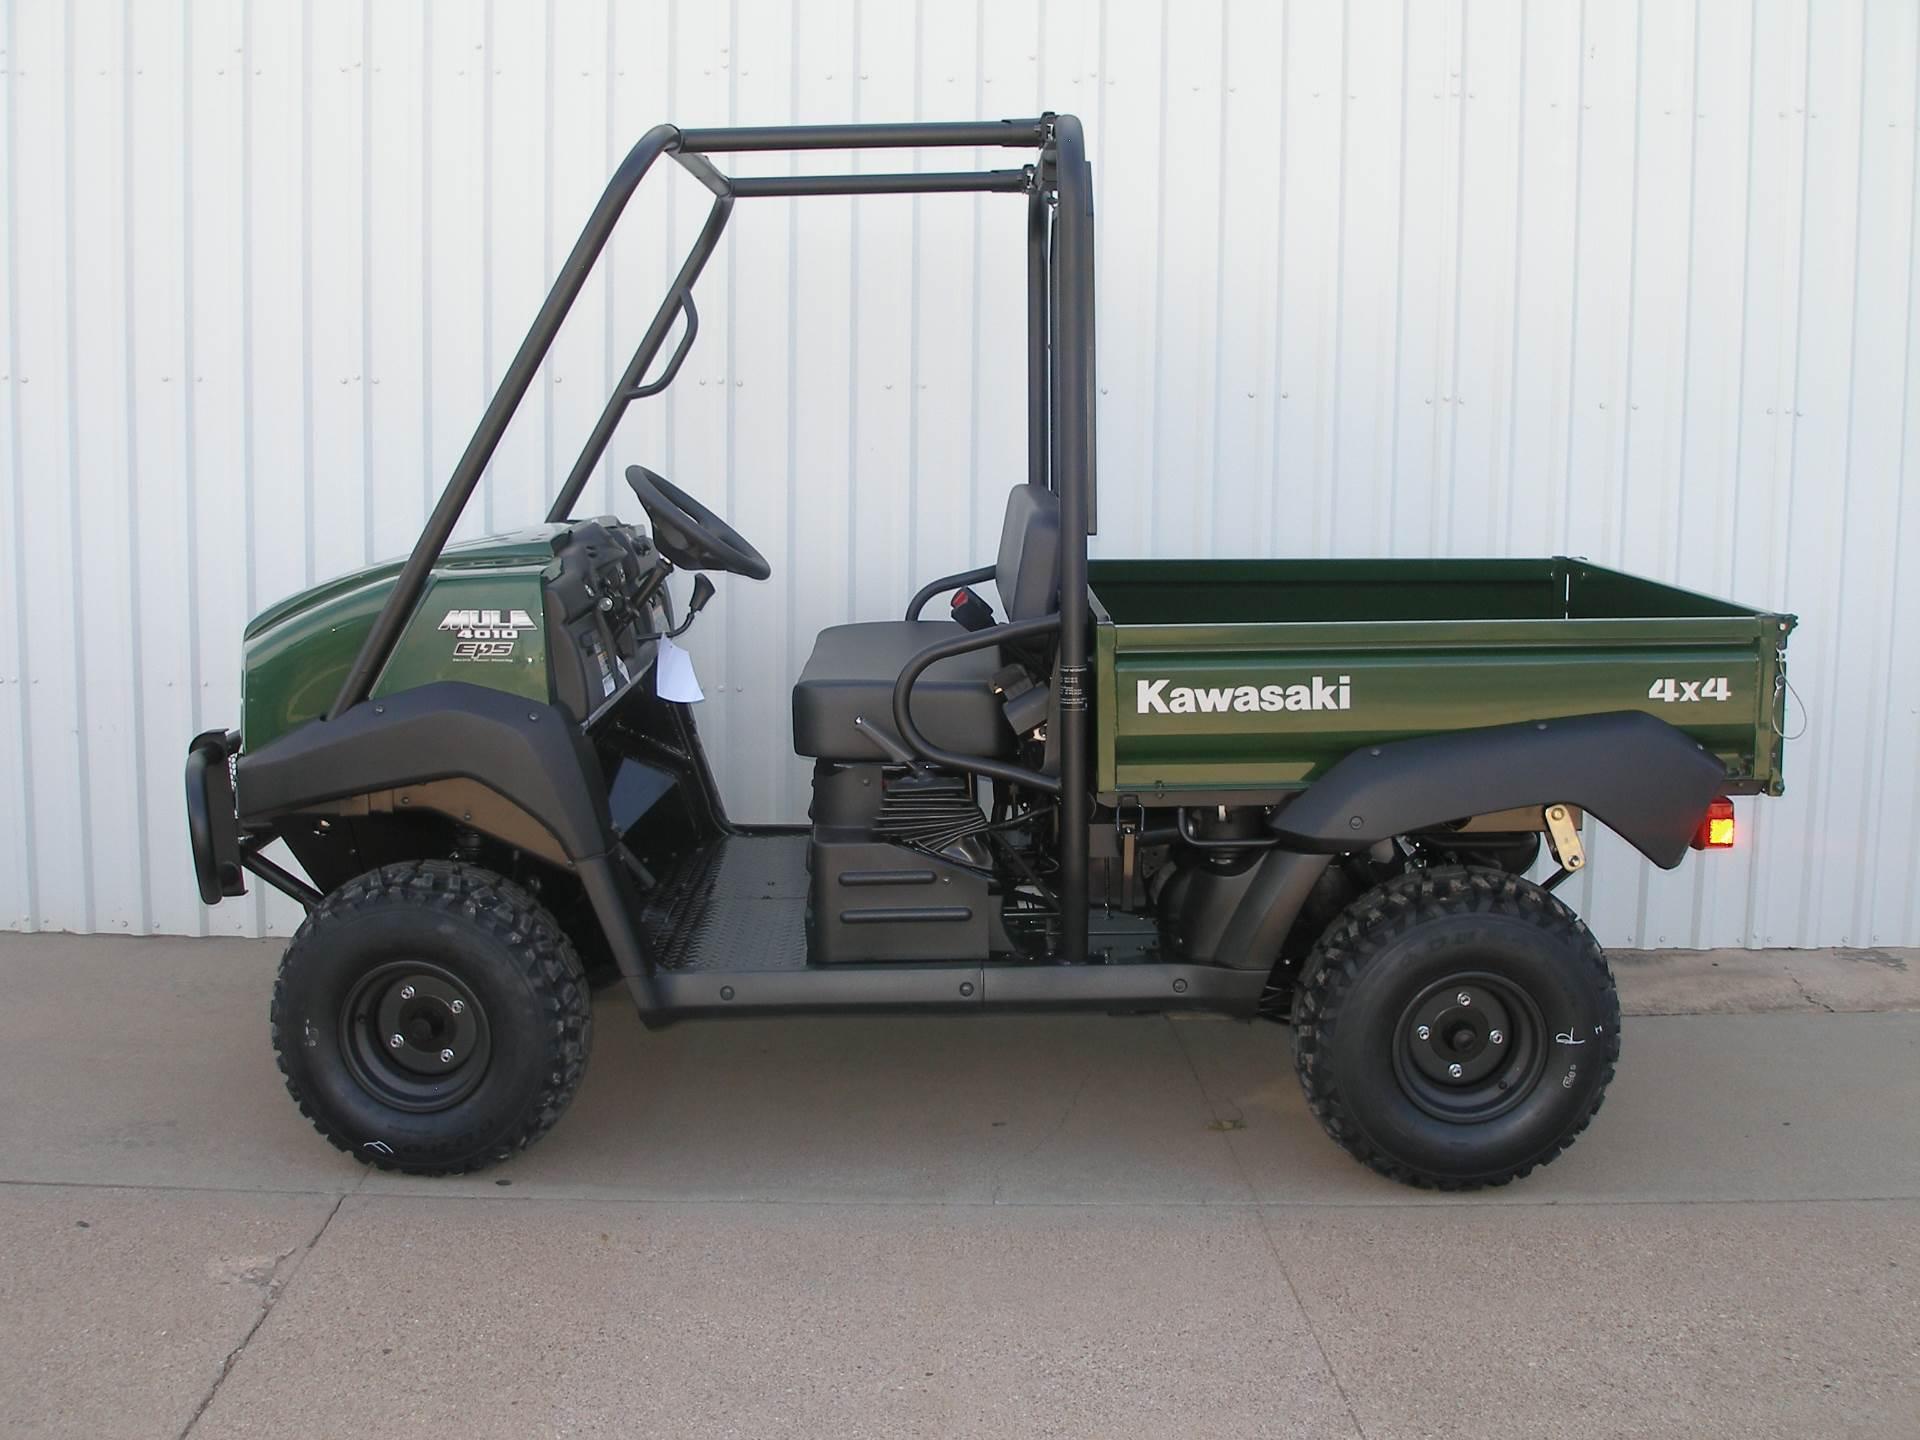 2019 Kawasaki Mule 4010 4x4 in Abilene, Texas